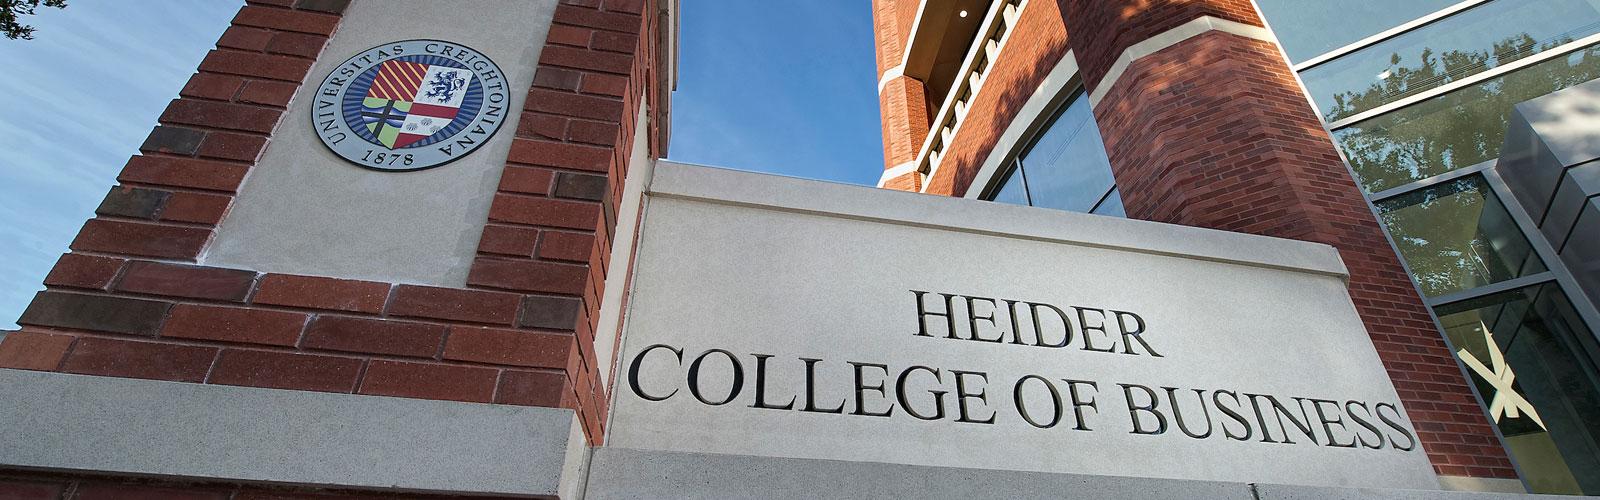 Heider College of Business at Creighton University